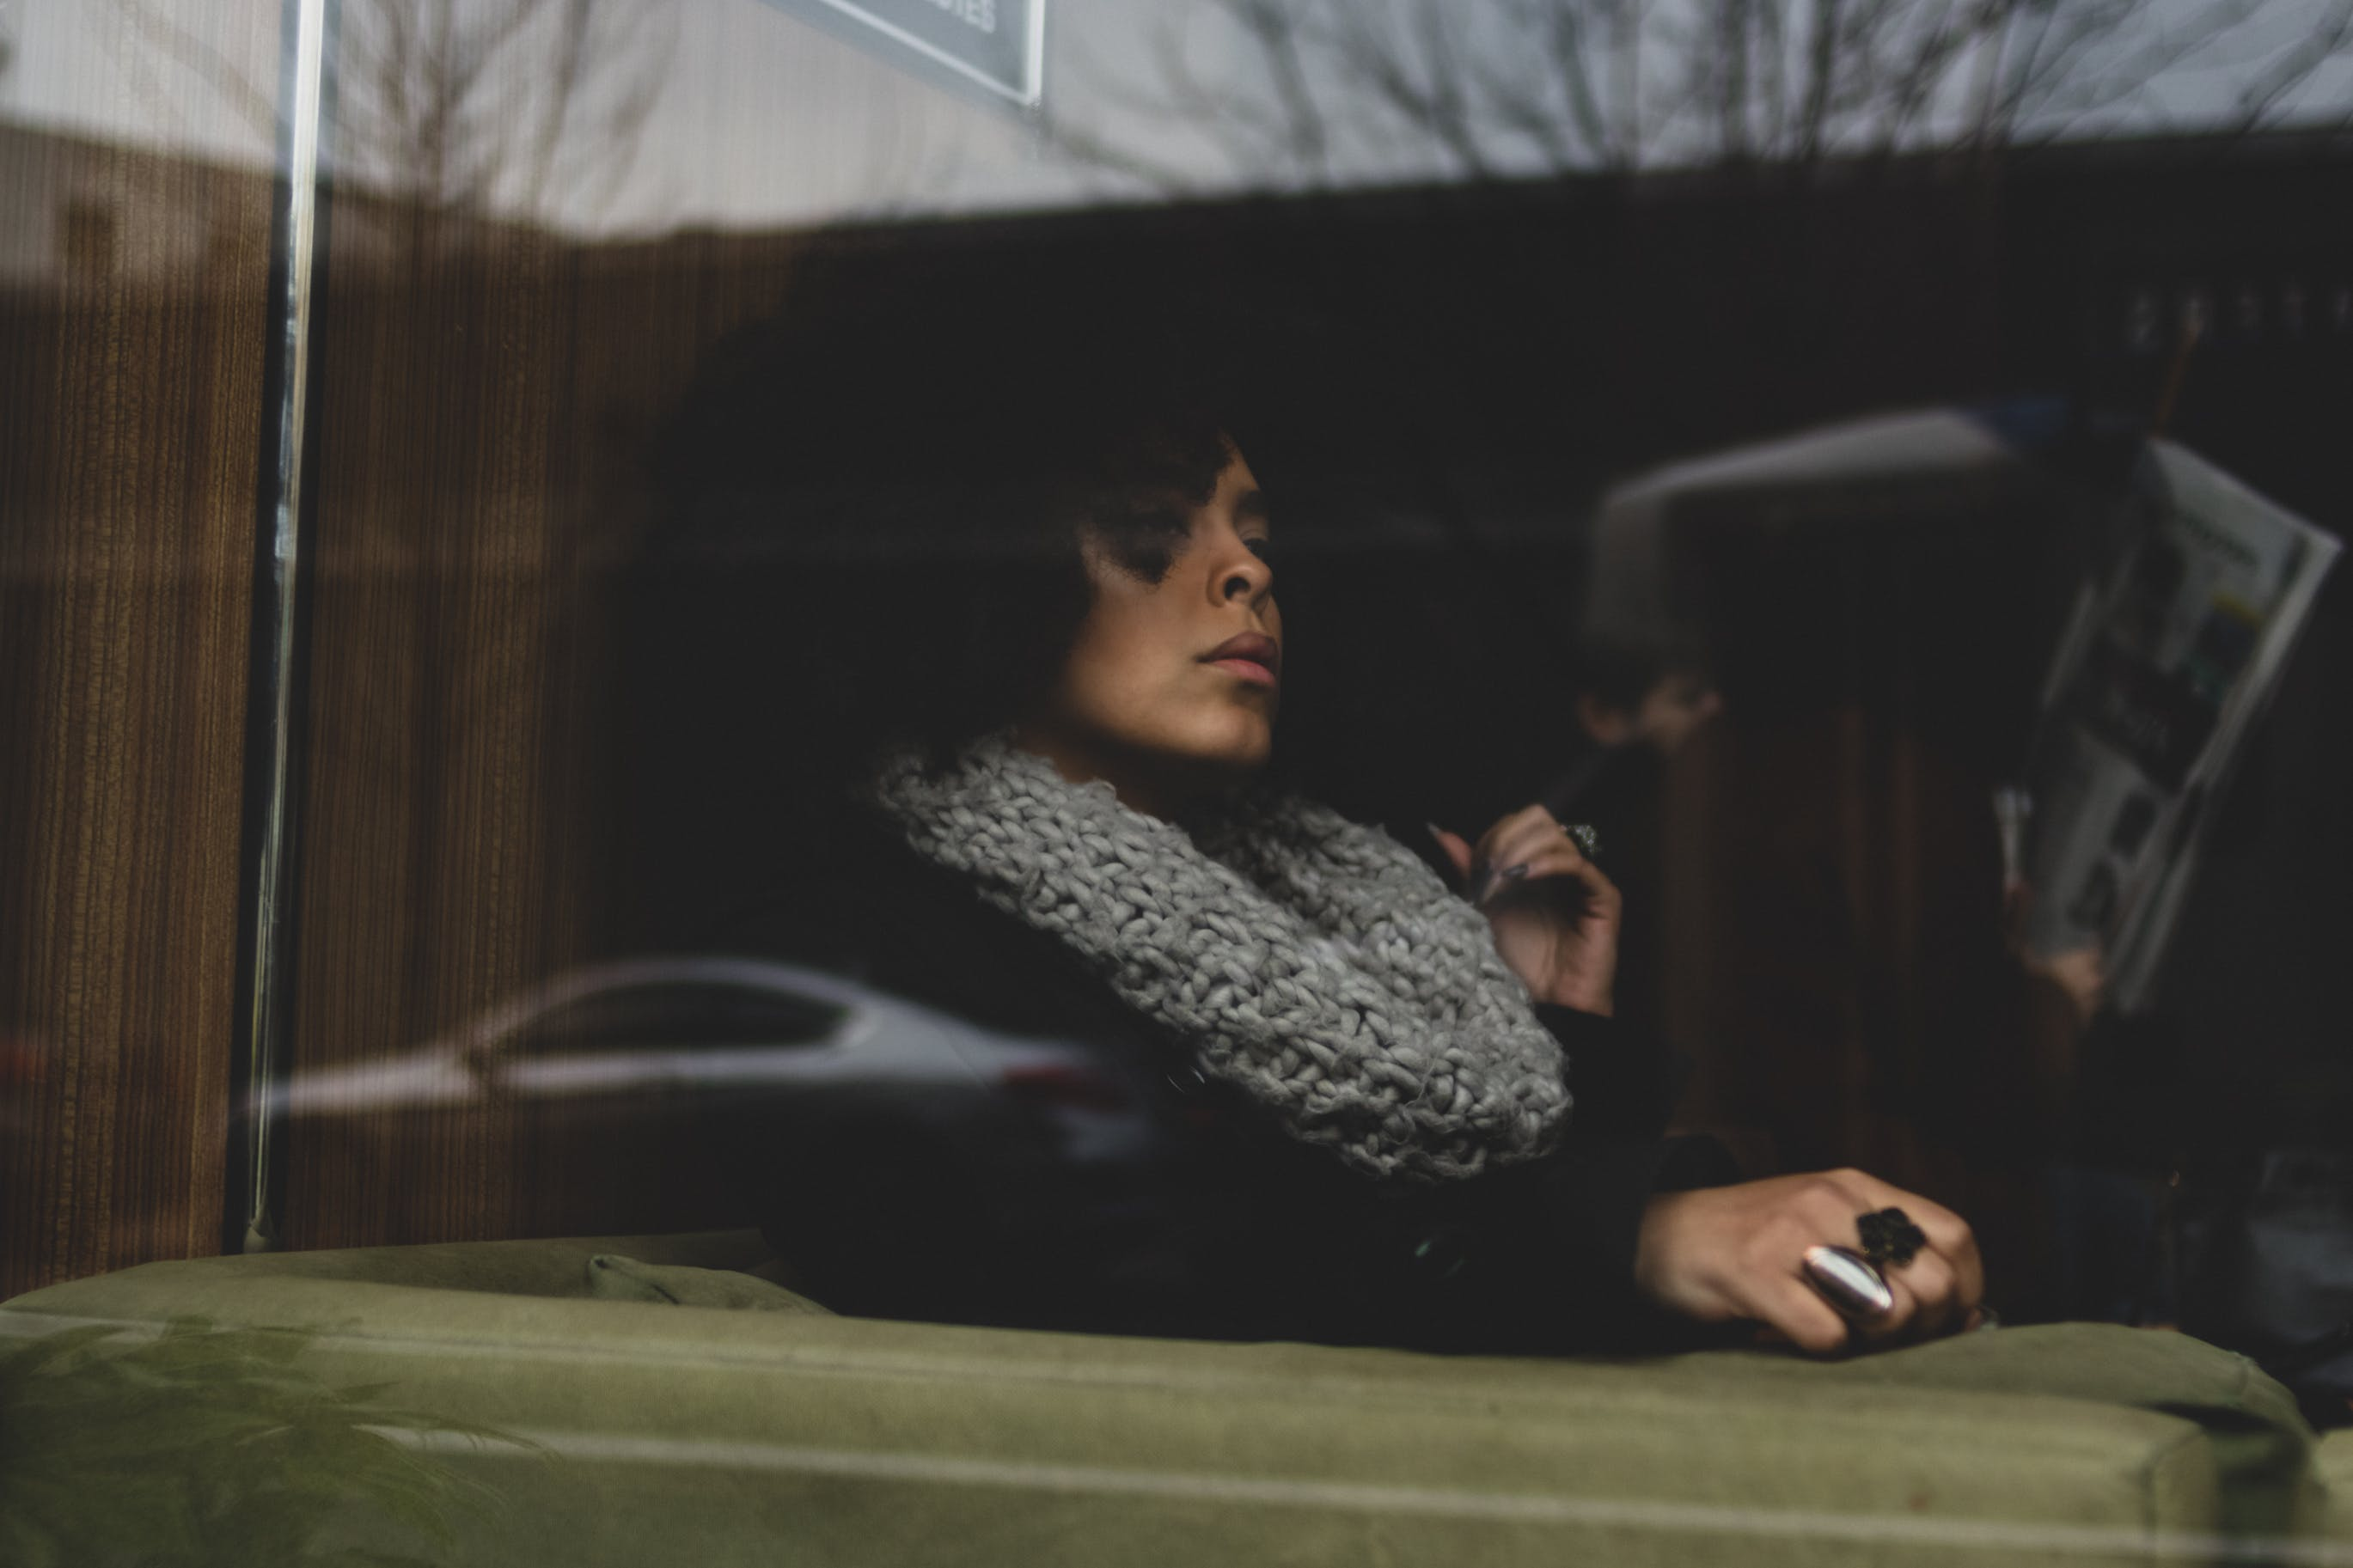 Woman Wearing Knit Scarf